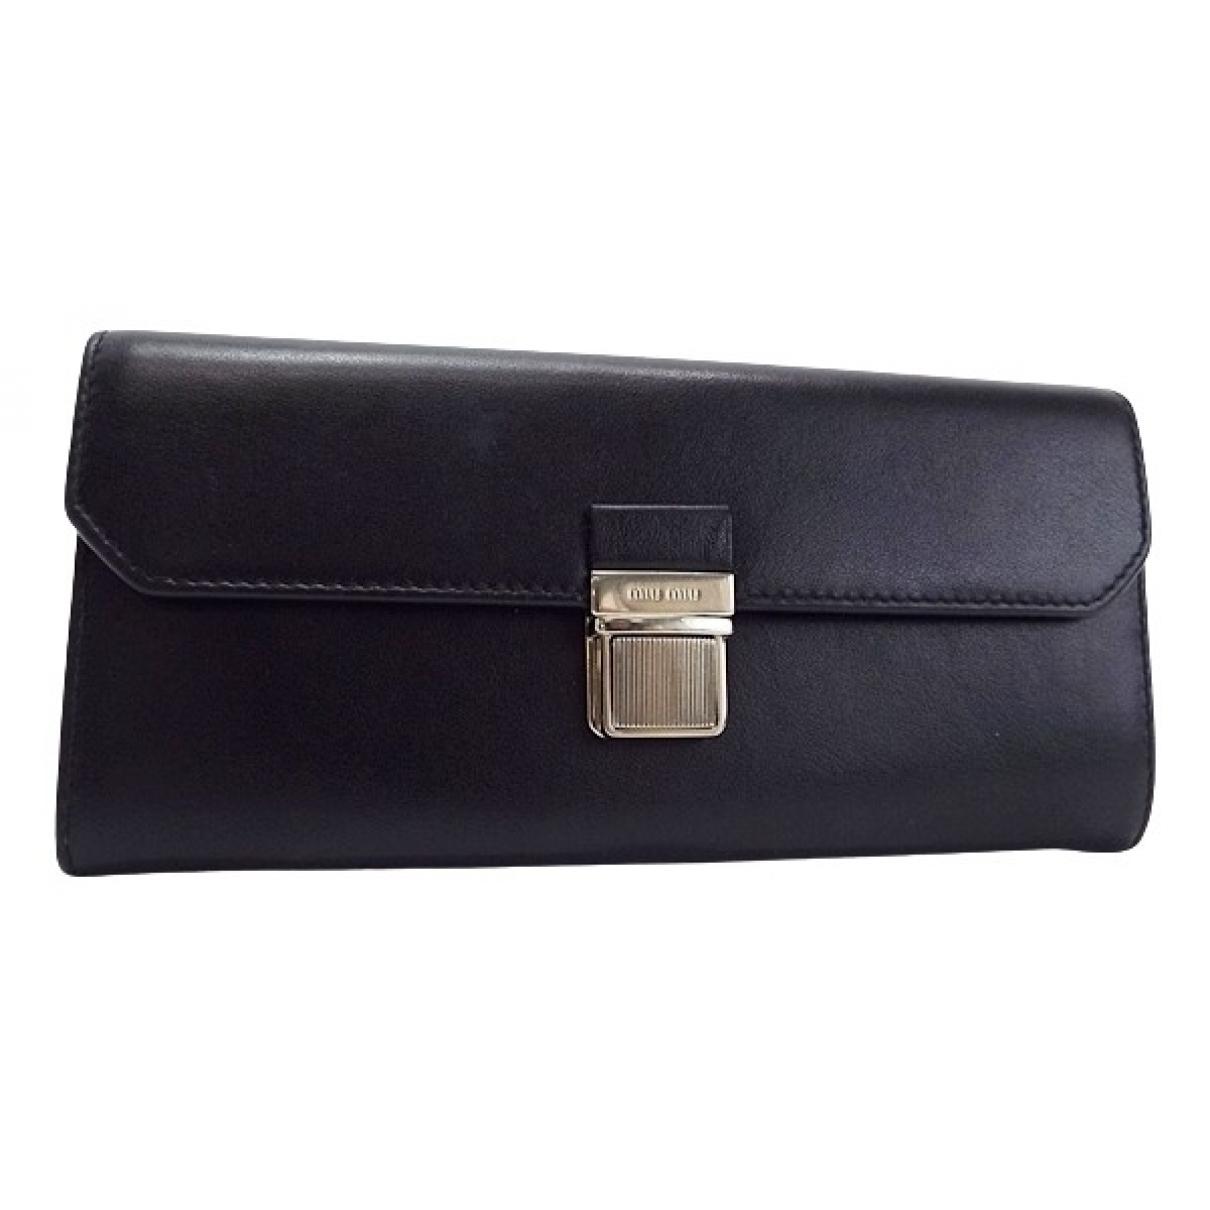 Miu Miu N Black Leather Small bag, wallet & cases for Men N